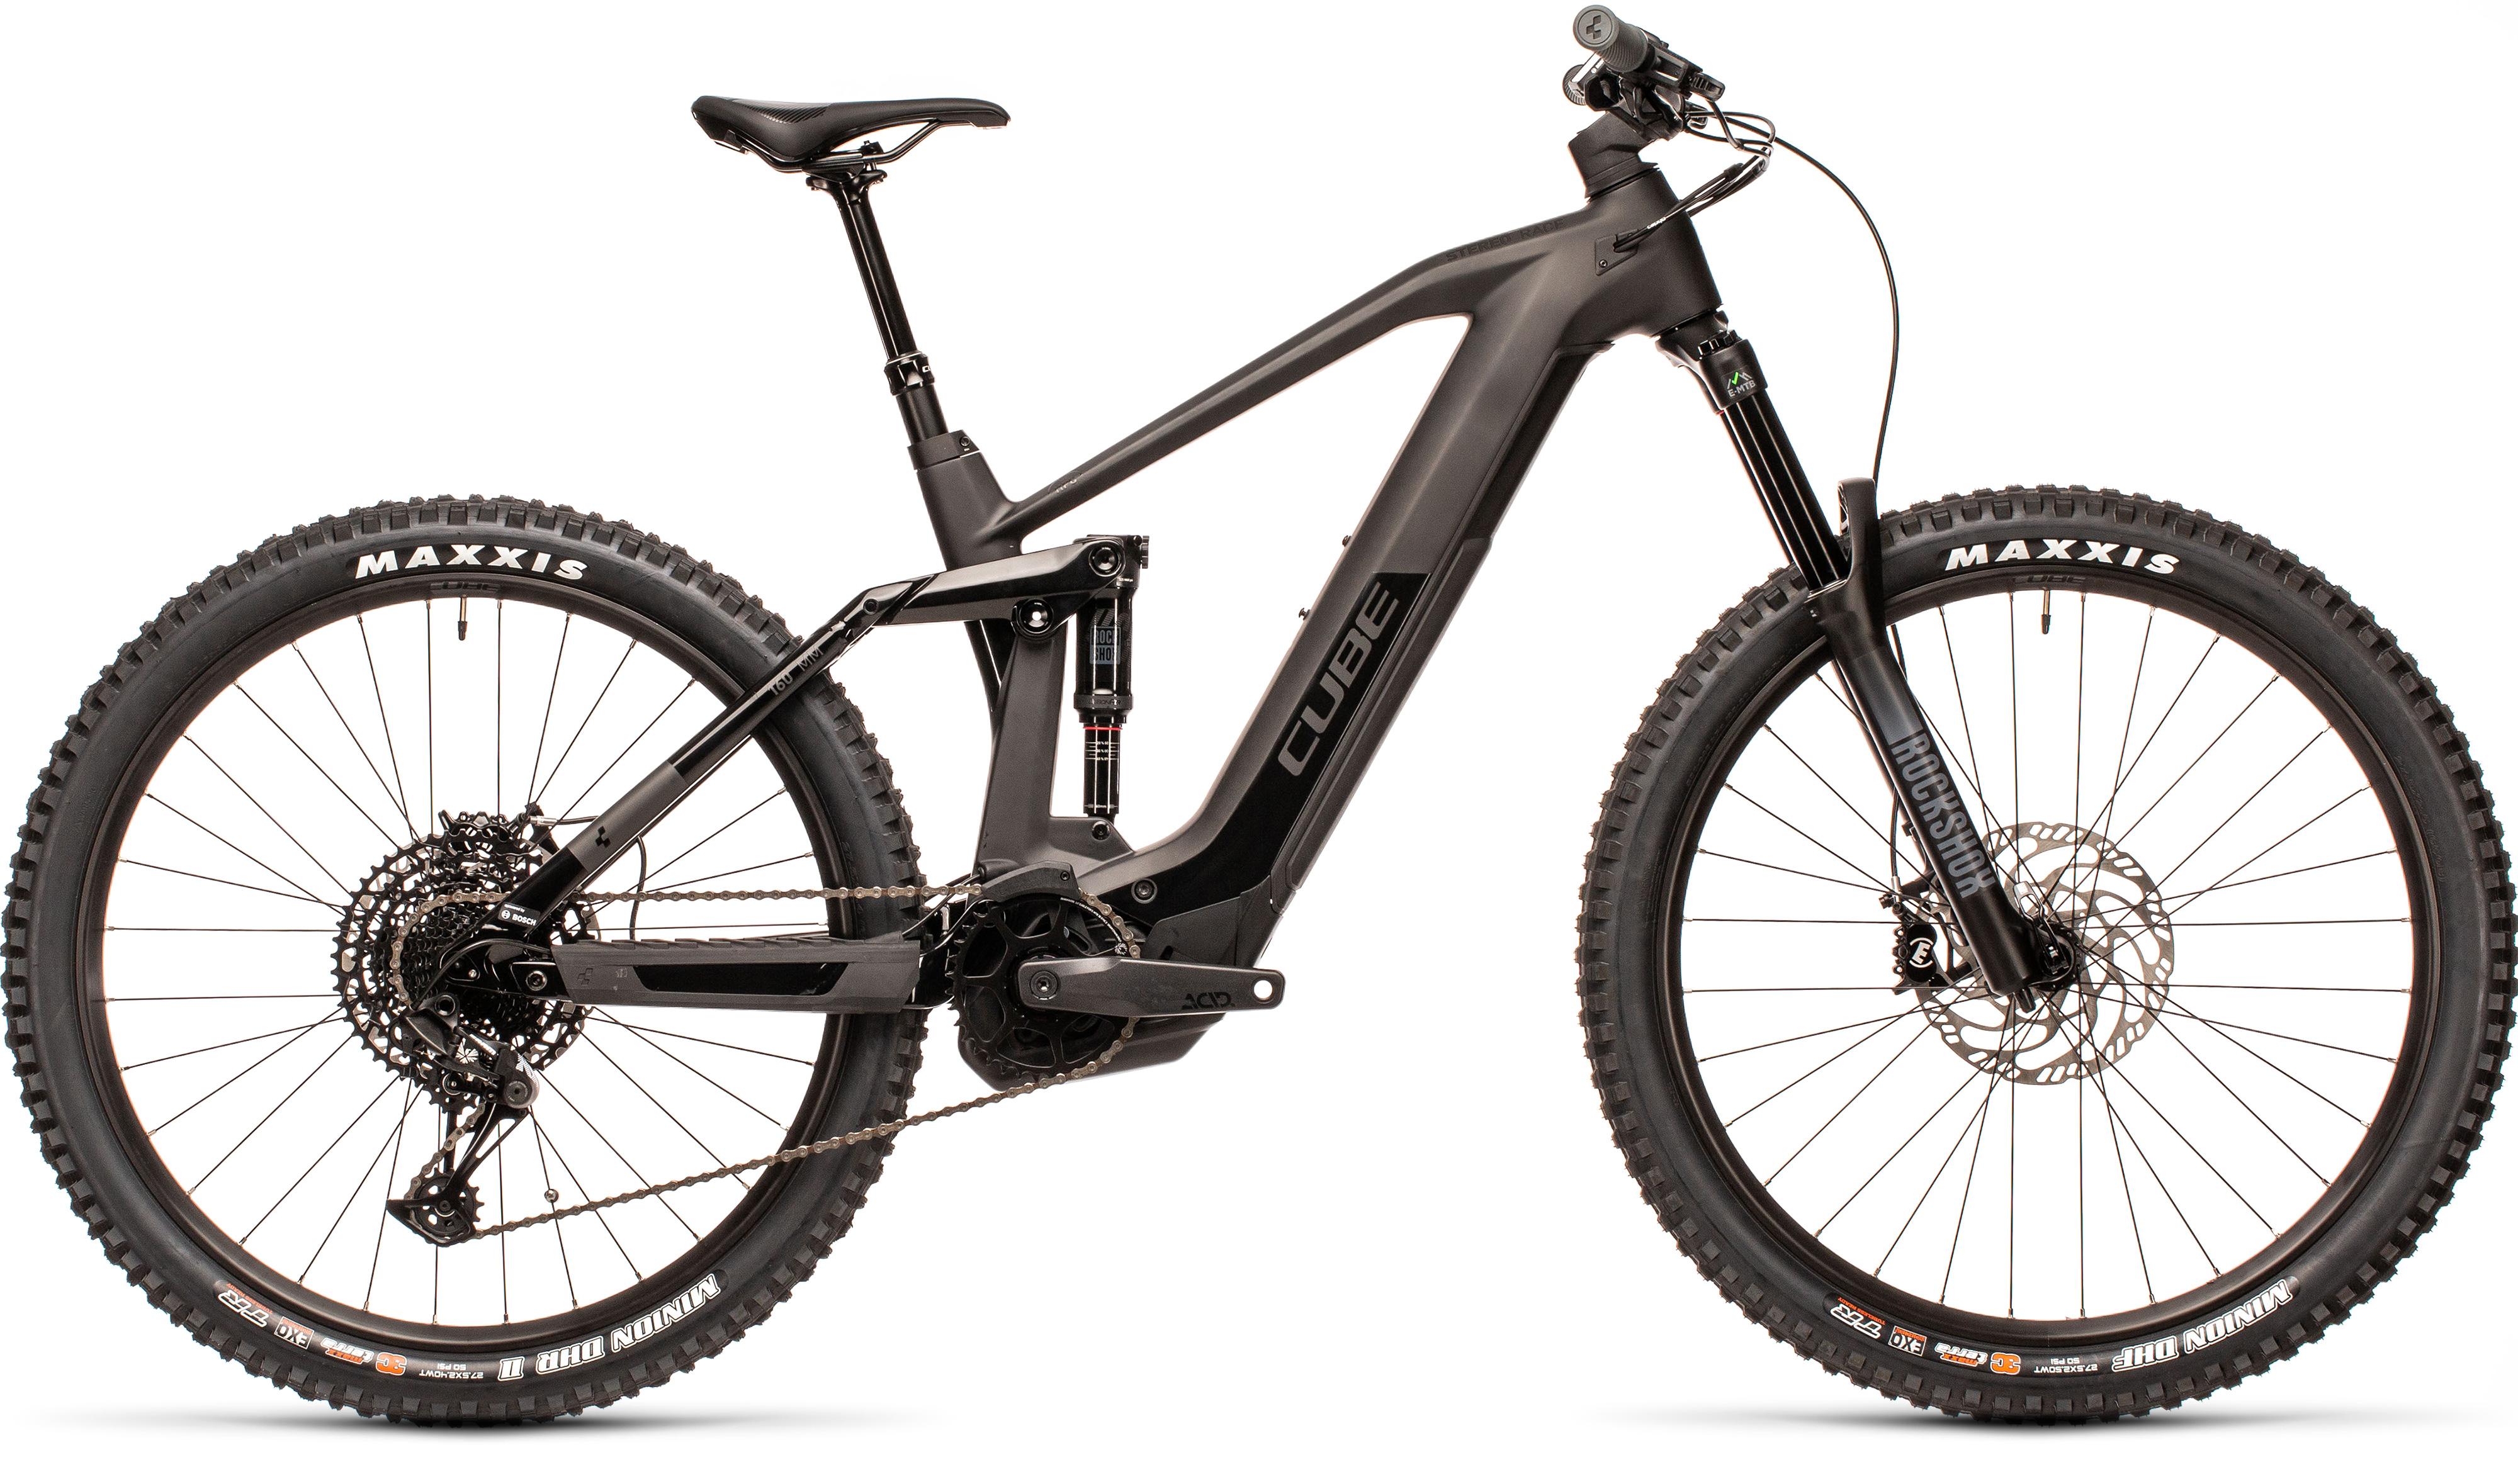 2021 Cube Stereo Hybrid 160 HPC Race 625 27.5 Electric Mountain Bike in Carbon/Black